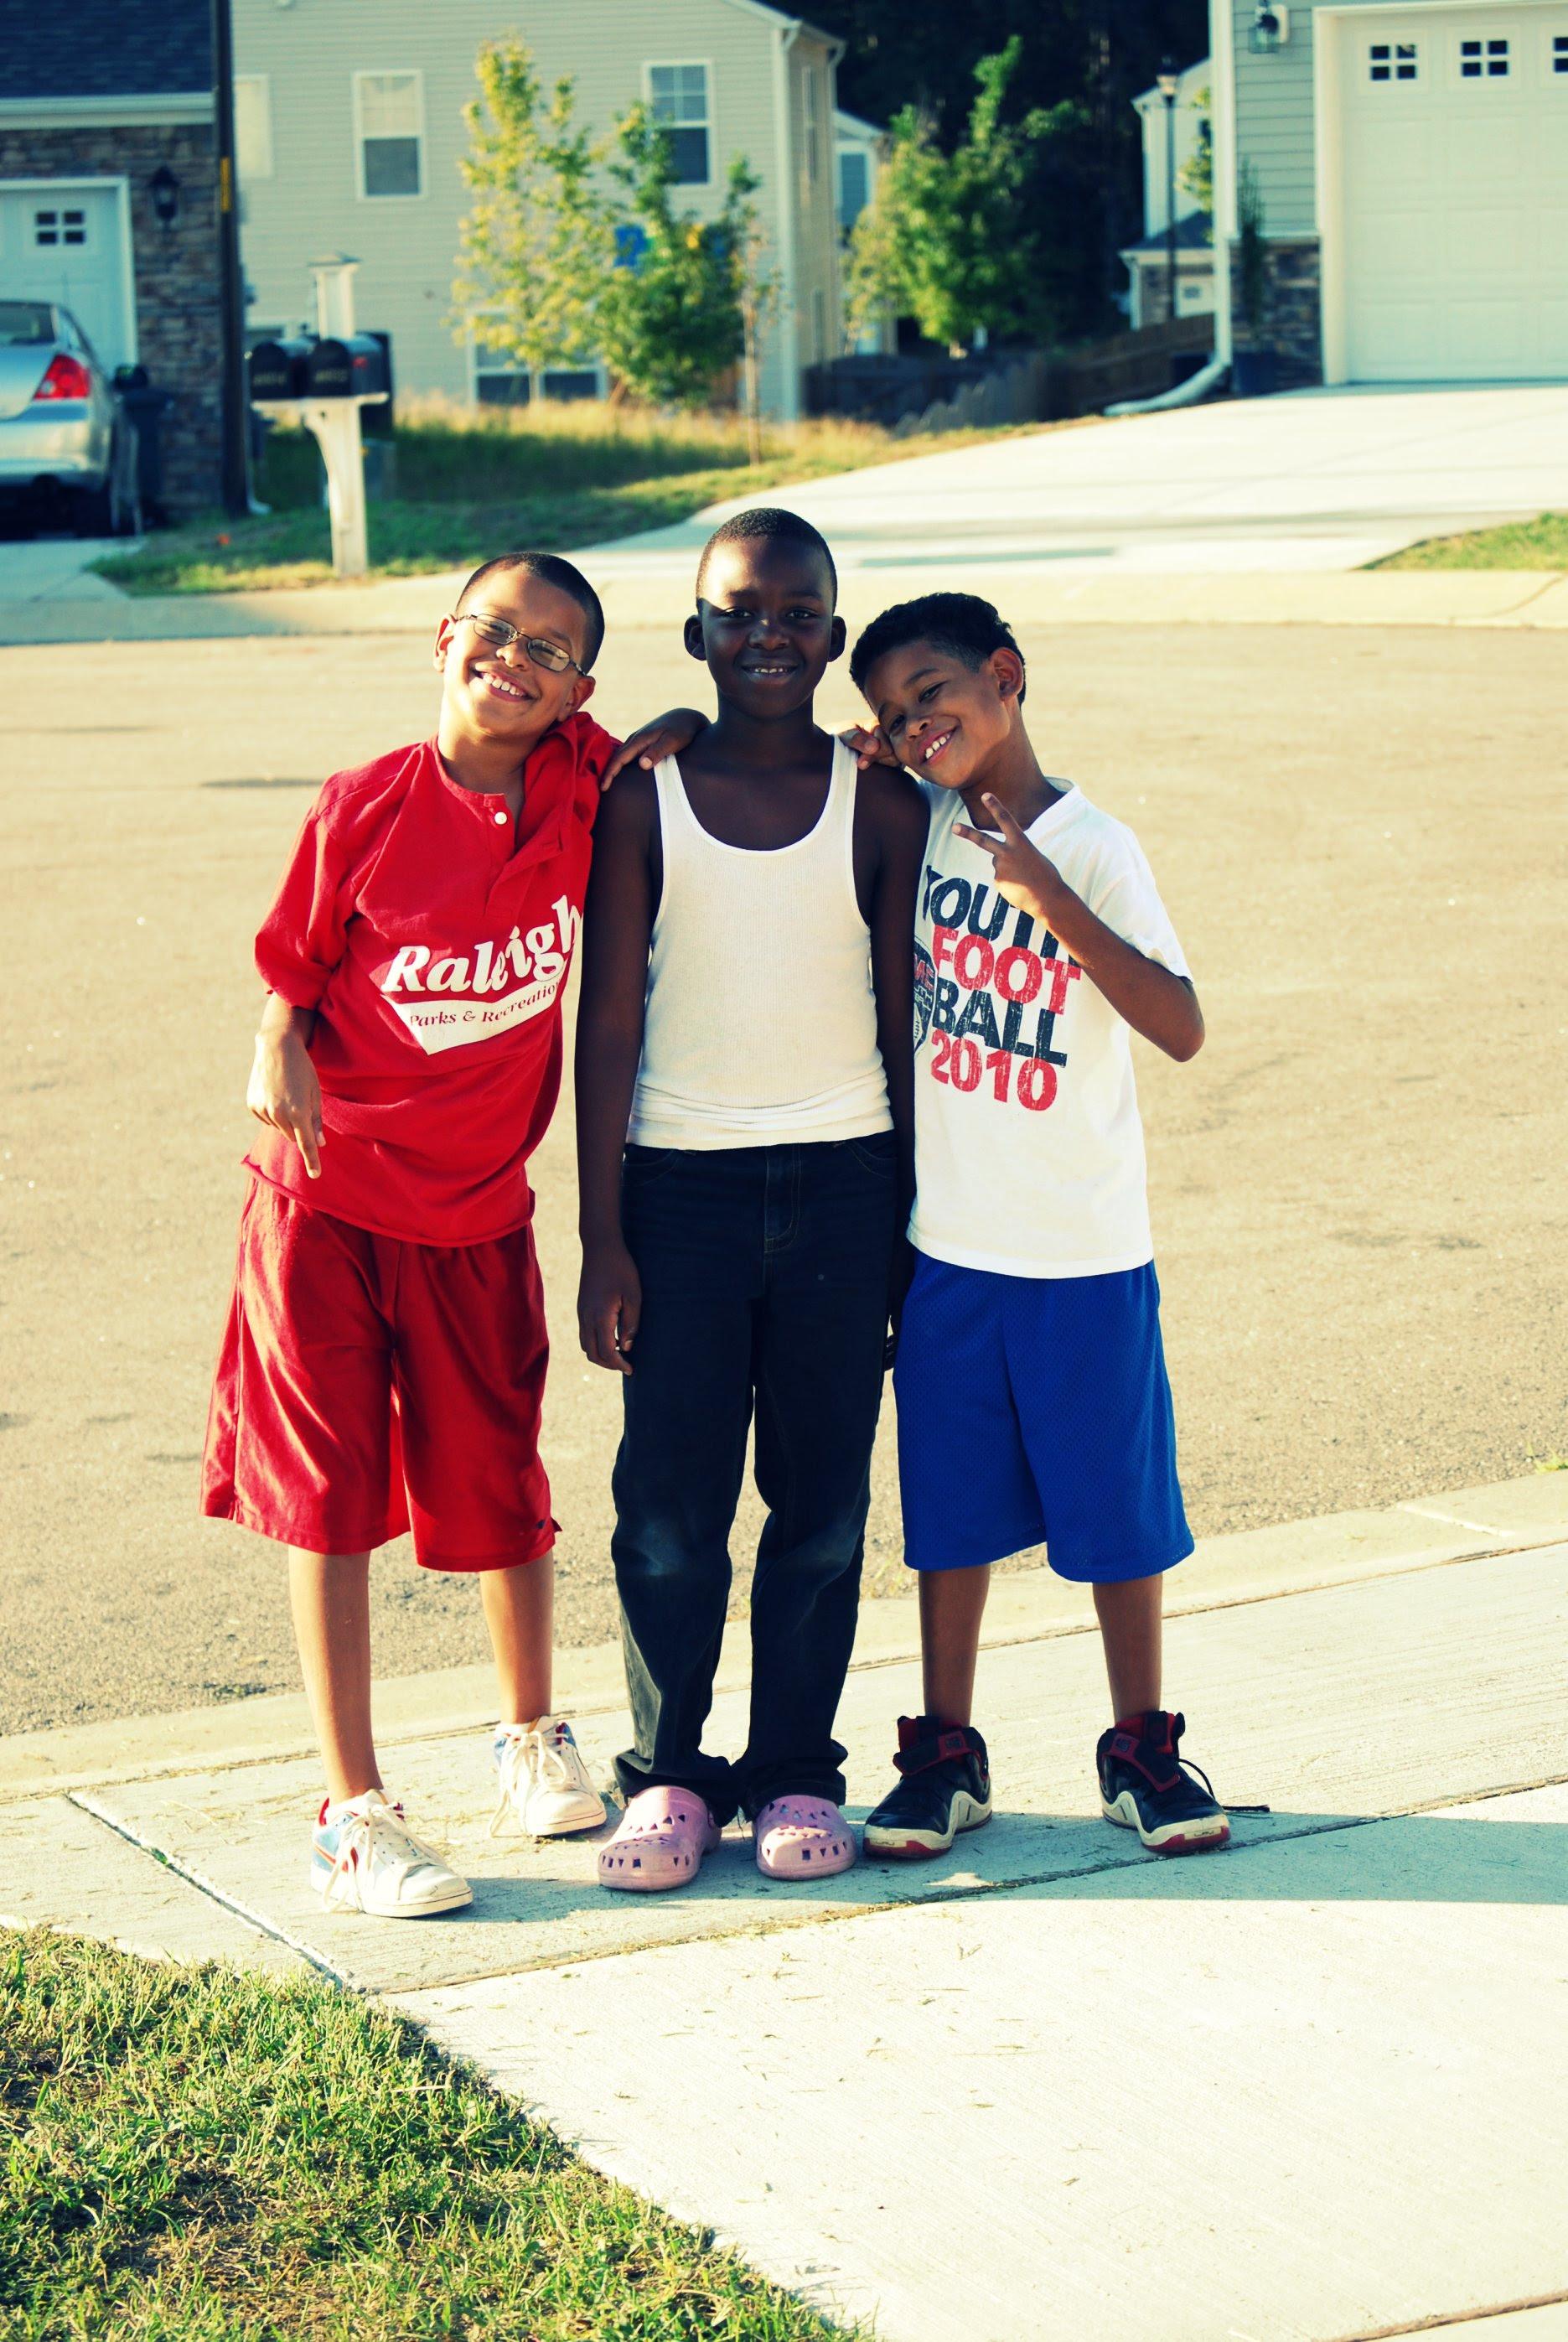 boys of the cul de sac